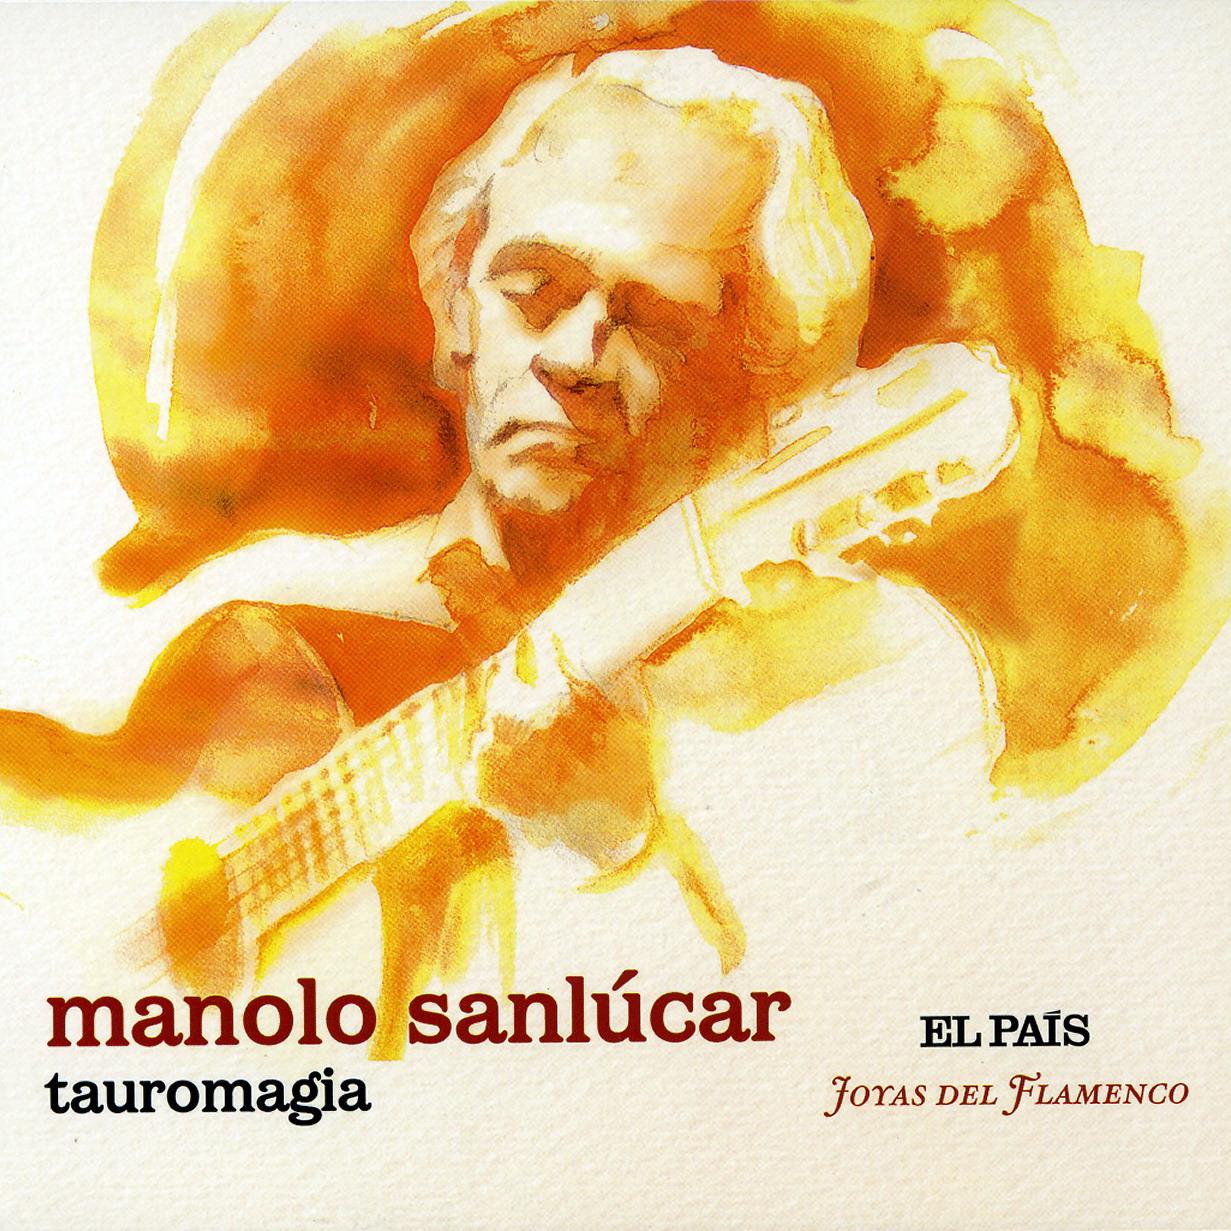 Manolo sanlucar - Tauromagia  460985ManoloSanlucarTauromagiafrontal2008